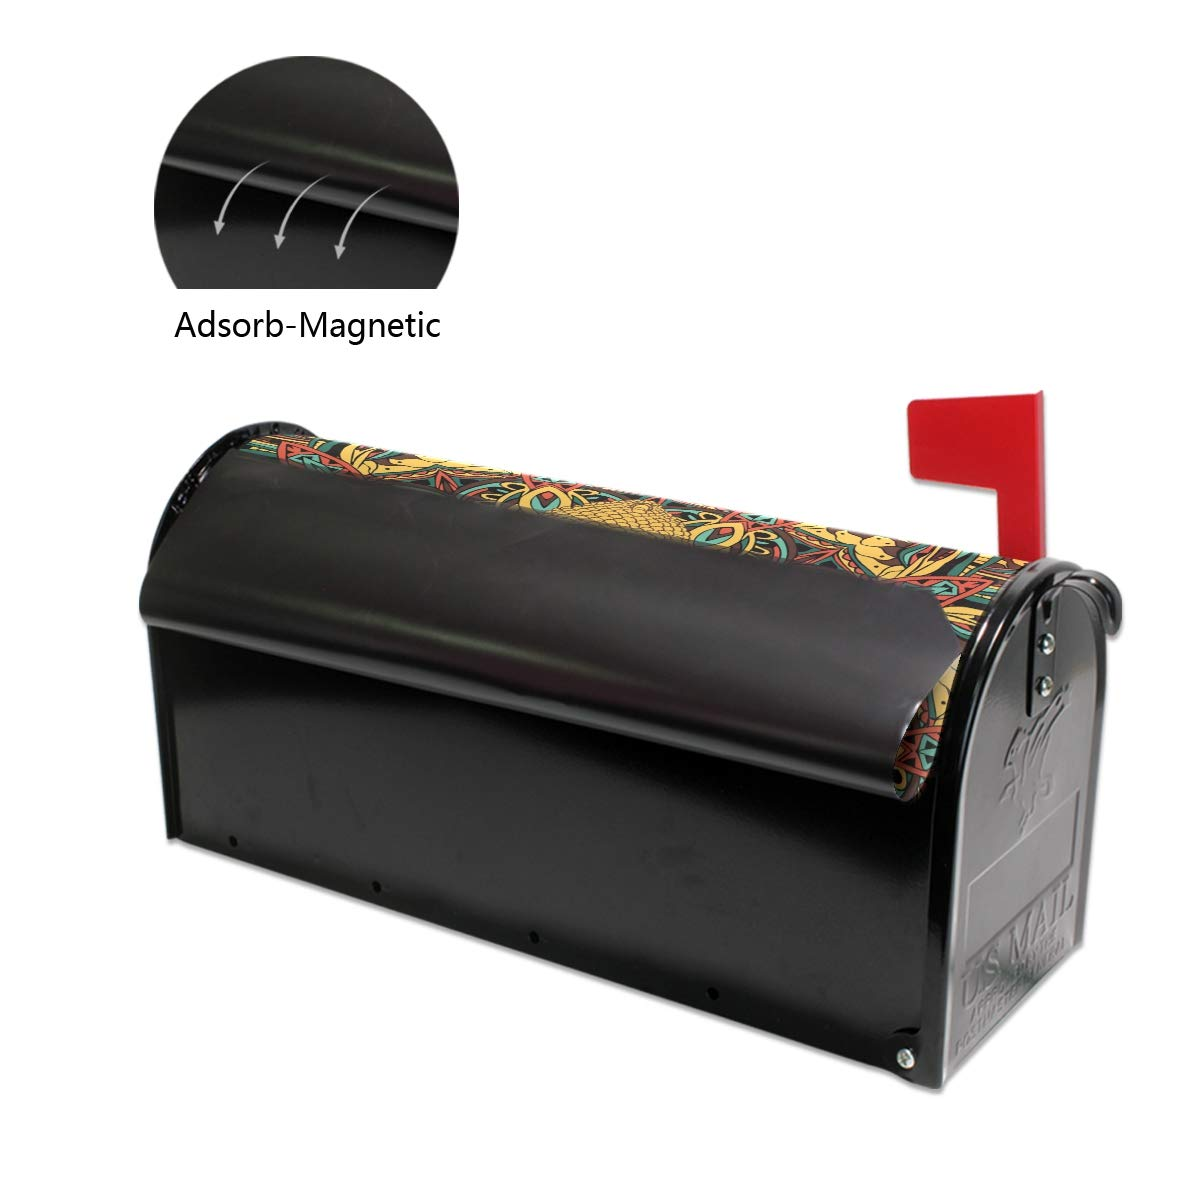 Printedin3D Buddah Buddhism Buddhist Zen Art Magnetic Mailbox Cover for US Standard Size